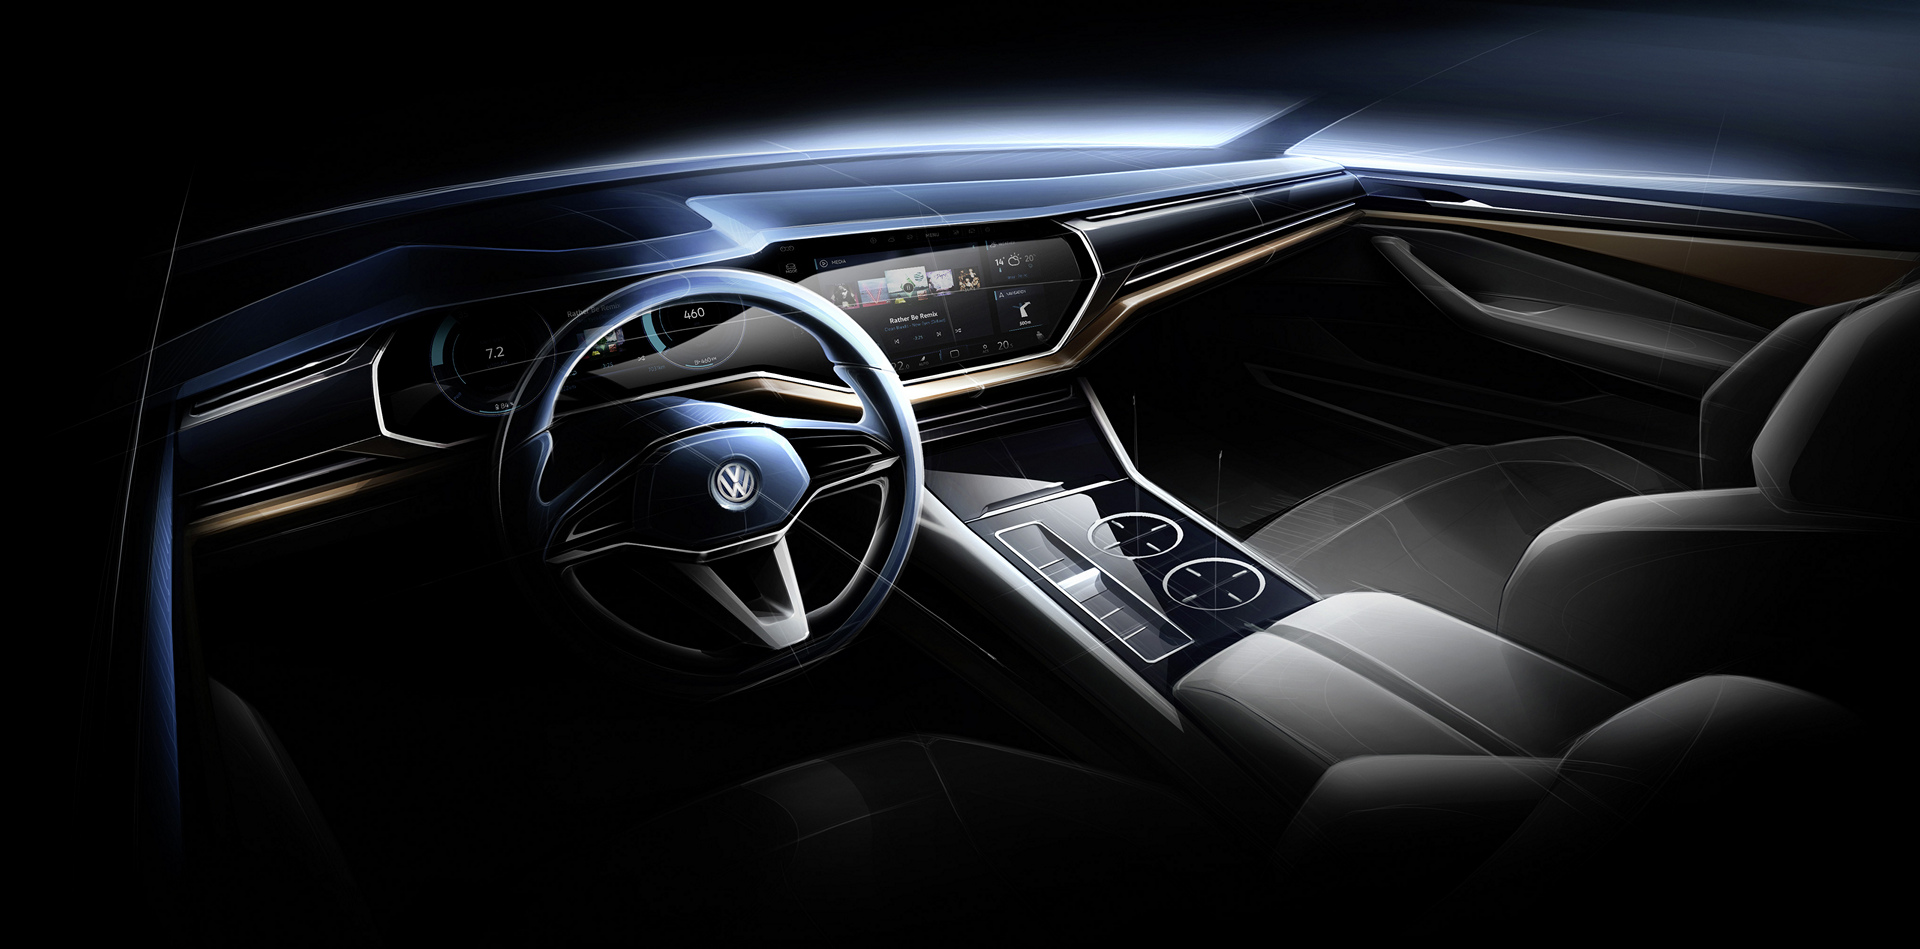 volkswagen t prime concept gte makes world premiere at auto china 2016 carrrs auto portal. Black Bedroom Furniture Sets. Home Design Ideas